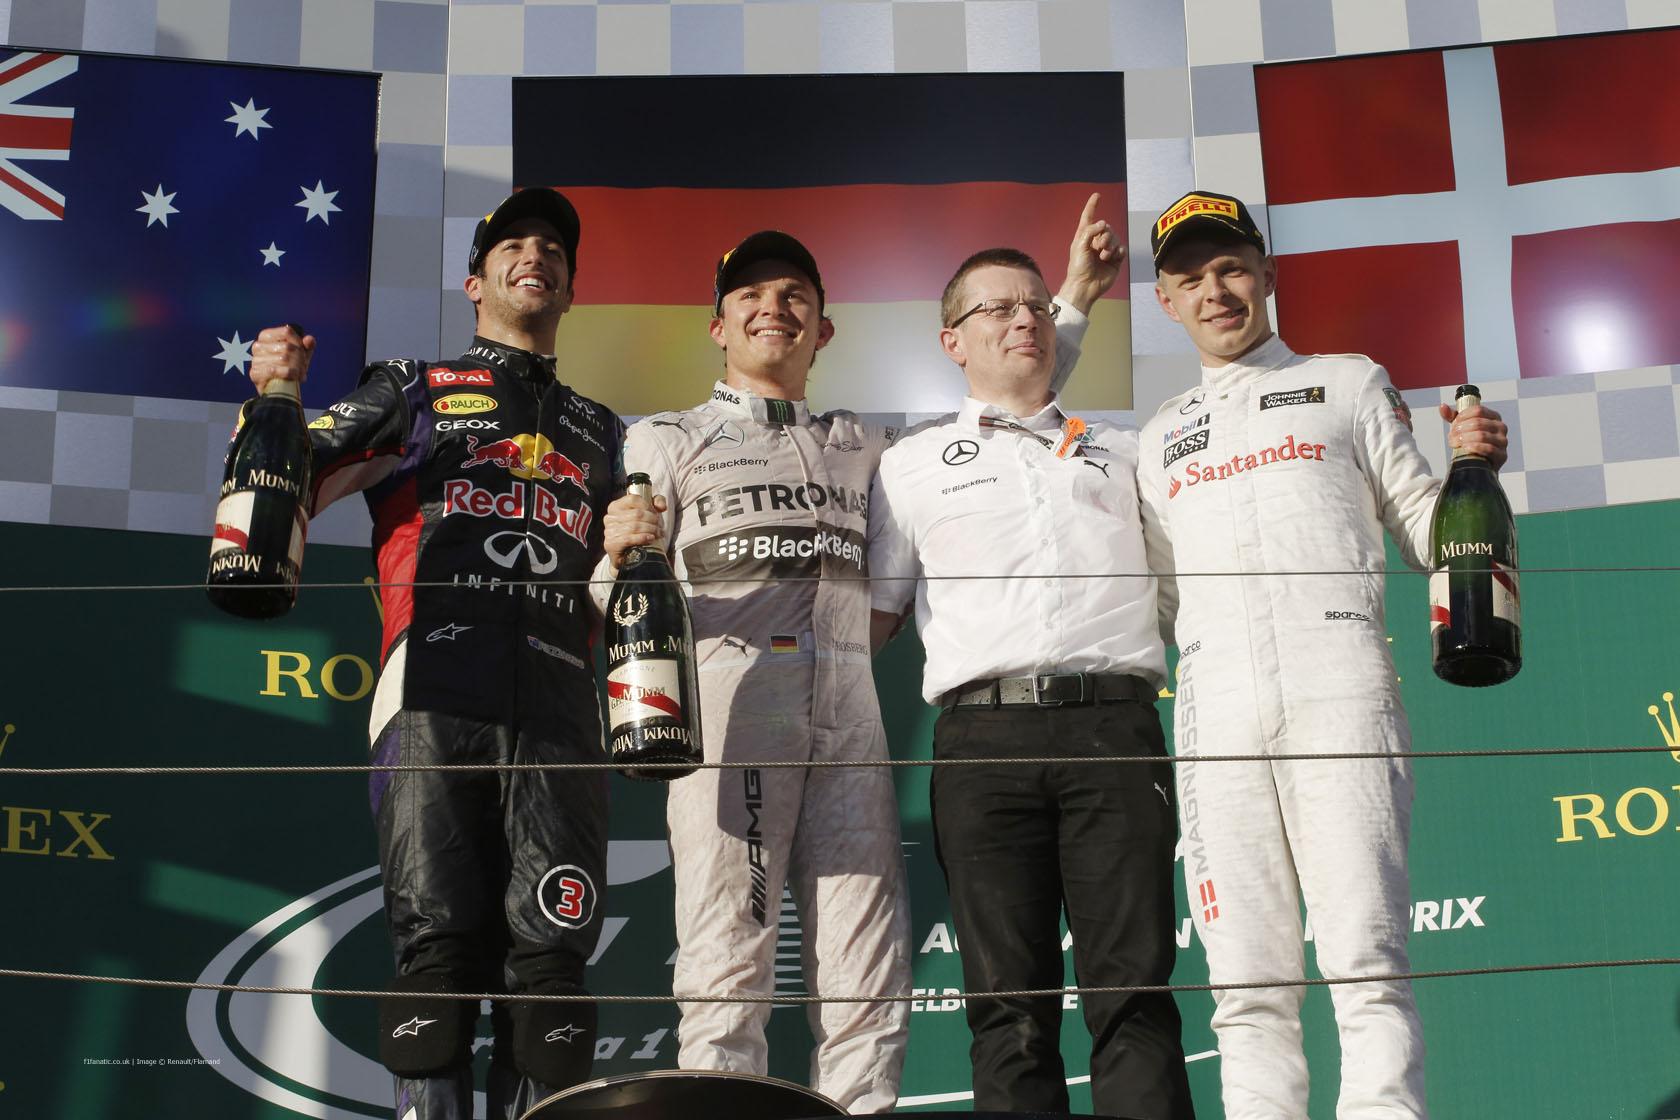 Daniel Ricciardo, Nico Rosberg, Kevin Magnussen, Melbourne, 2014